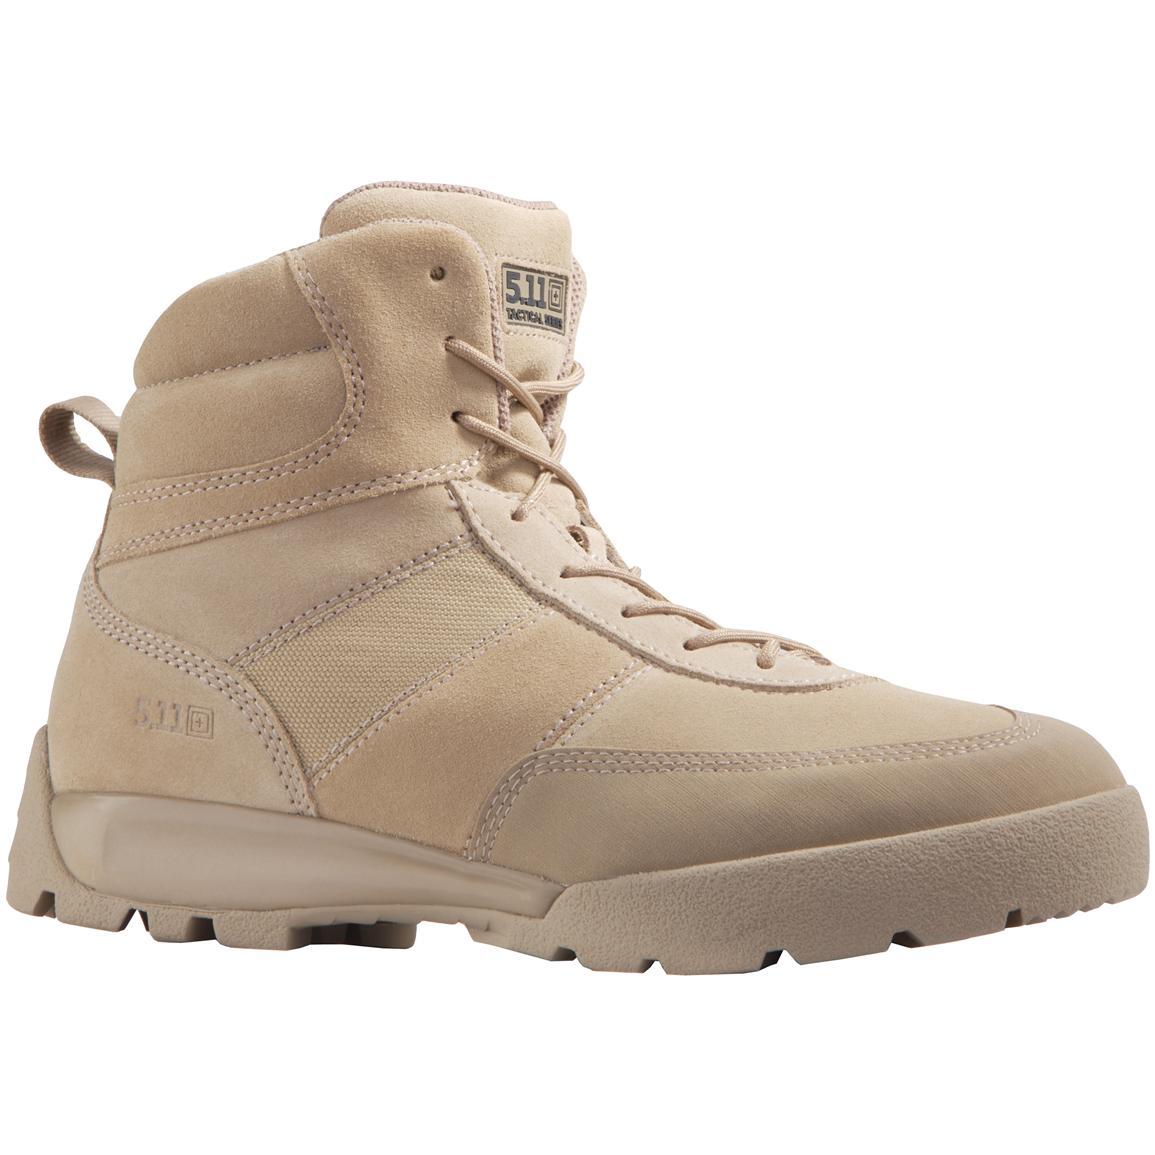 5 11 Tactical Atac 8 Side Zip Boot Tactical Blog